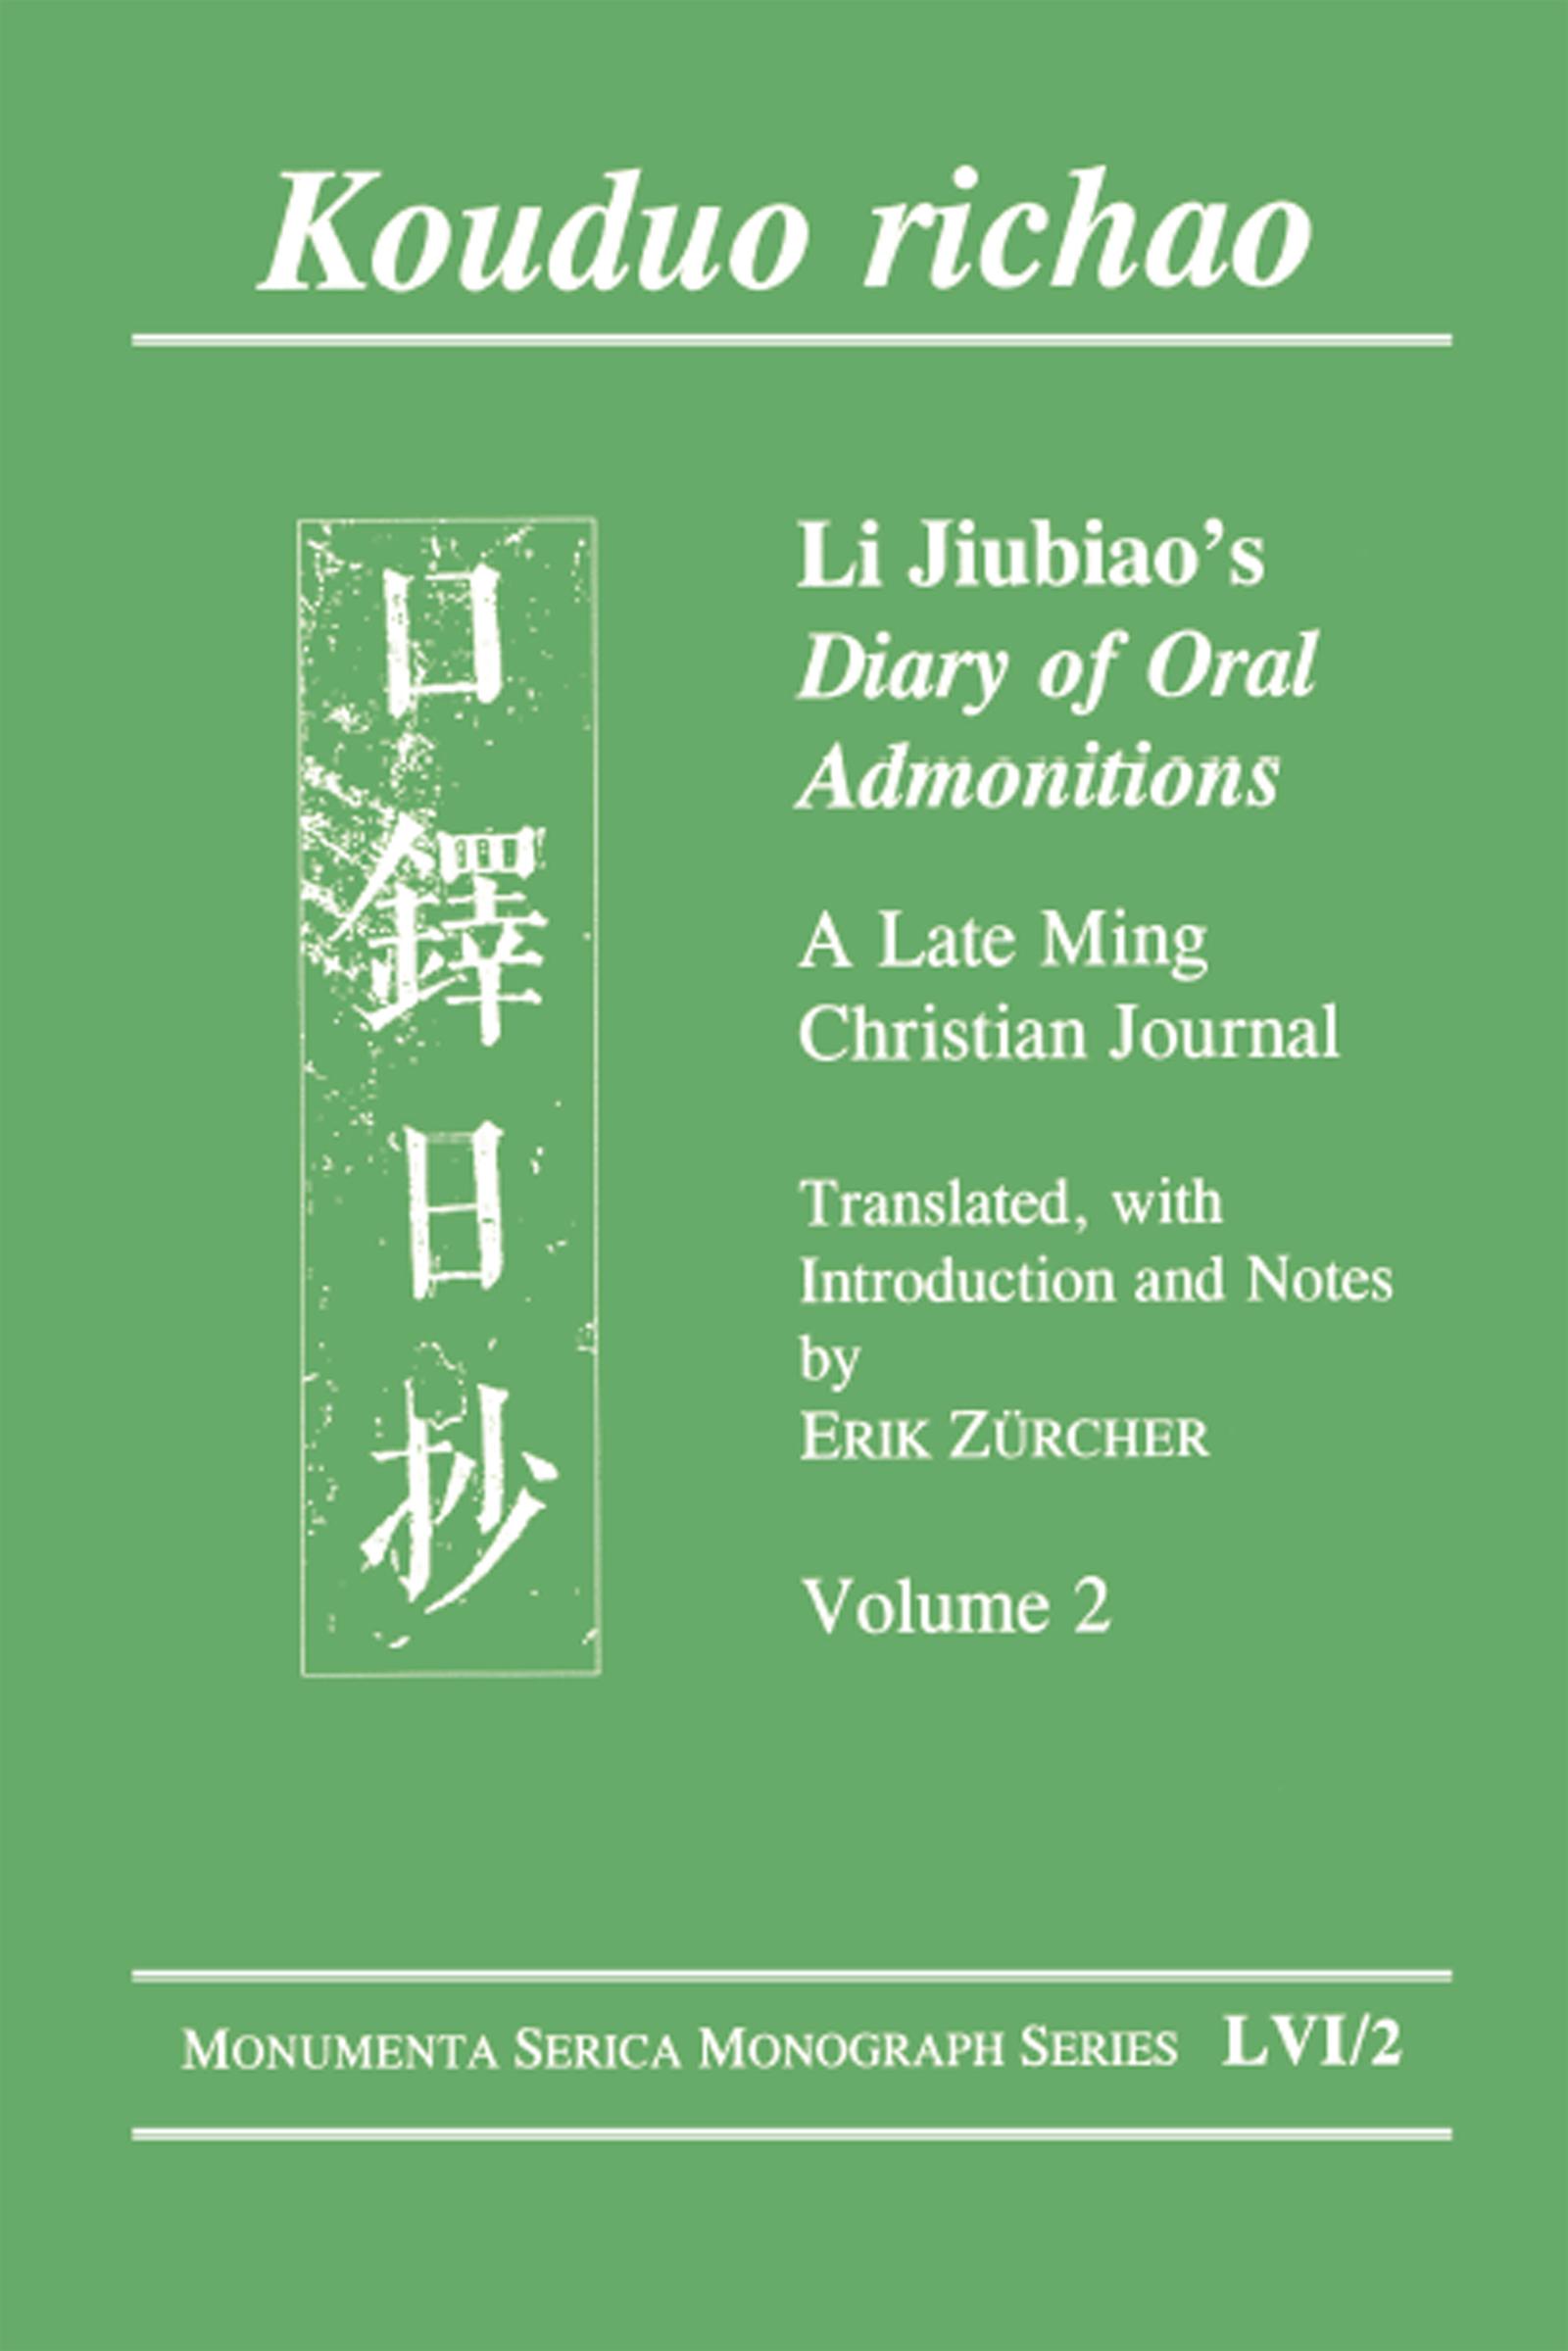 Kouduo richao. Li Jiubiao's Diary of Oral Admonitions. A Late Ming Christian Journal